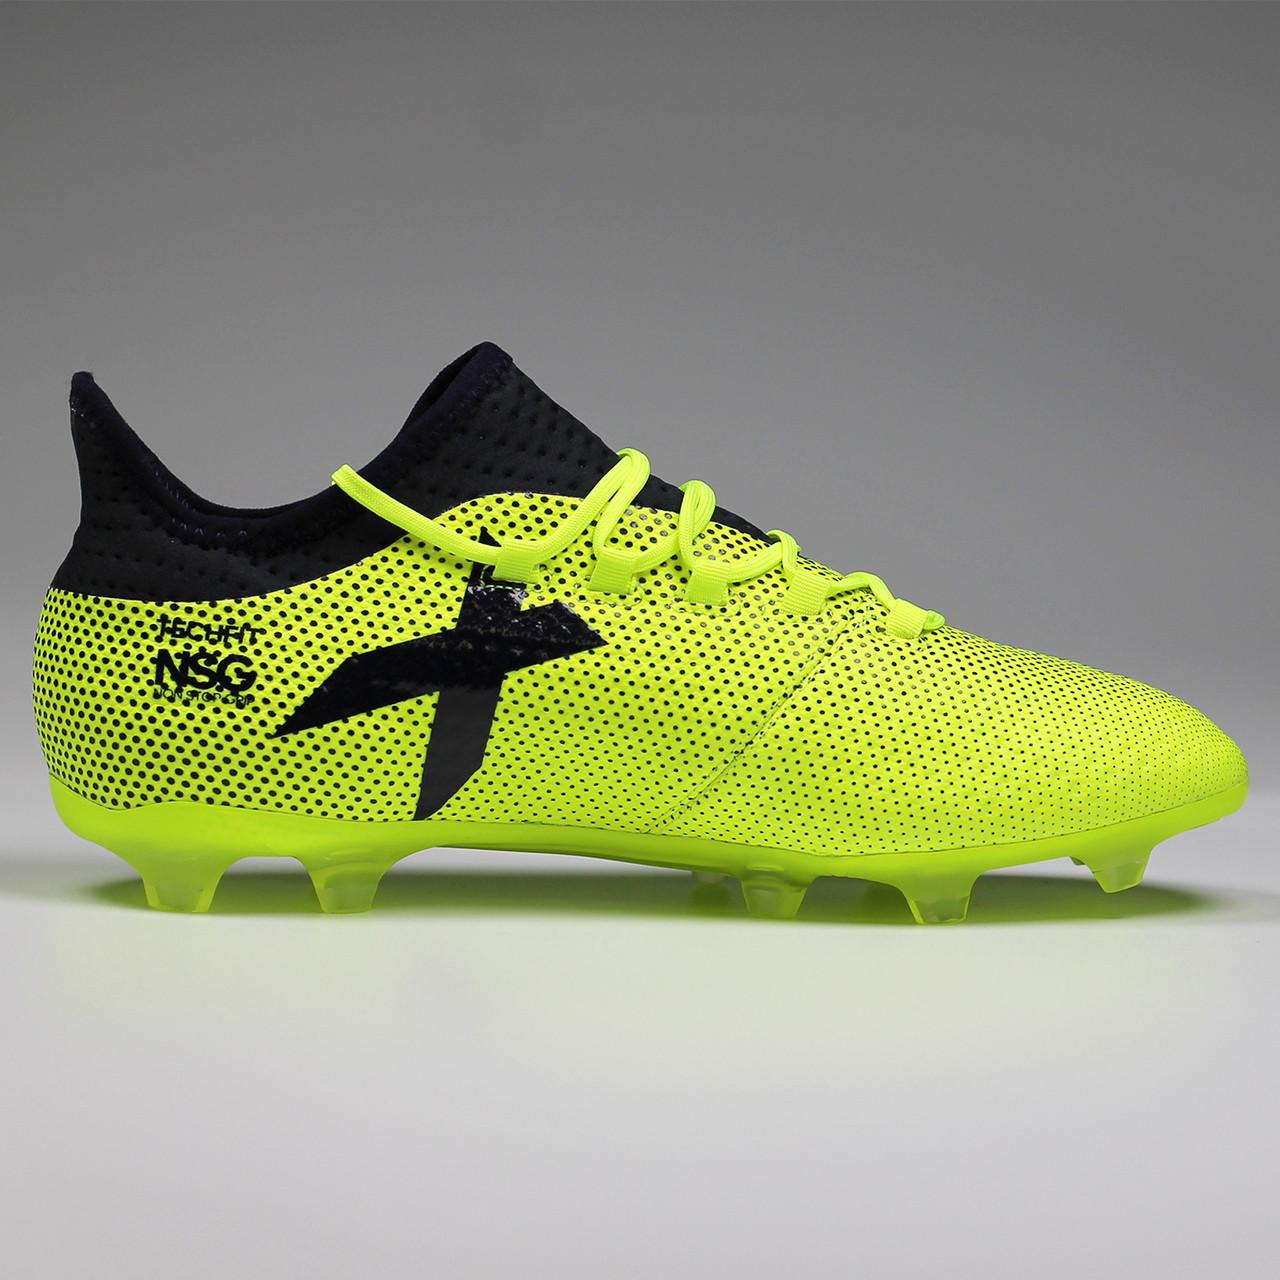 2b06da56301f Adidas X 17.2 FG Men's Soccer Cleats S82325 - Yellow